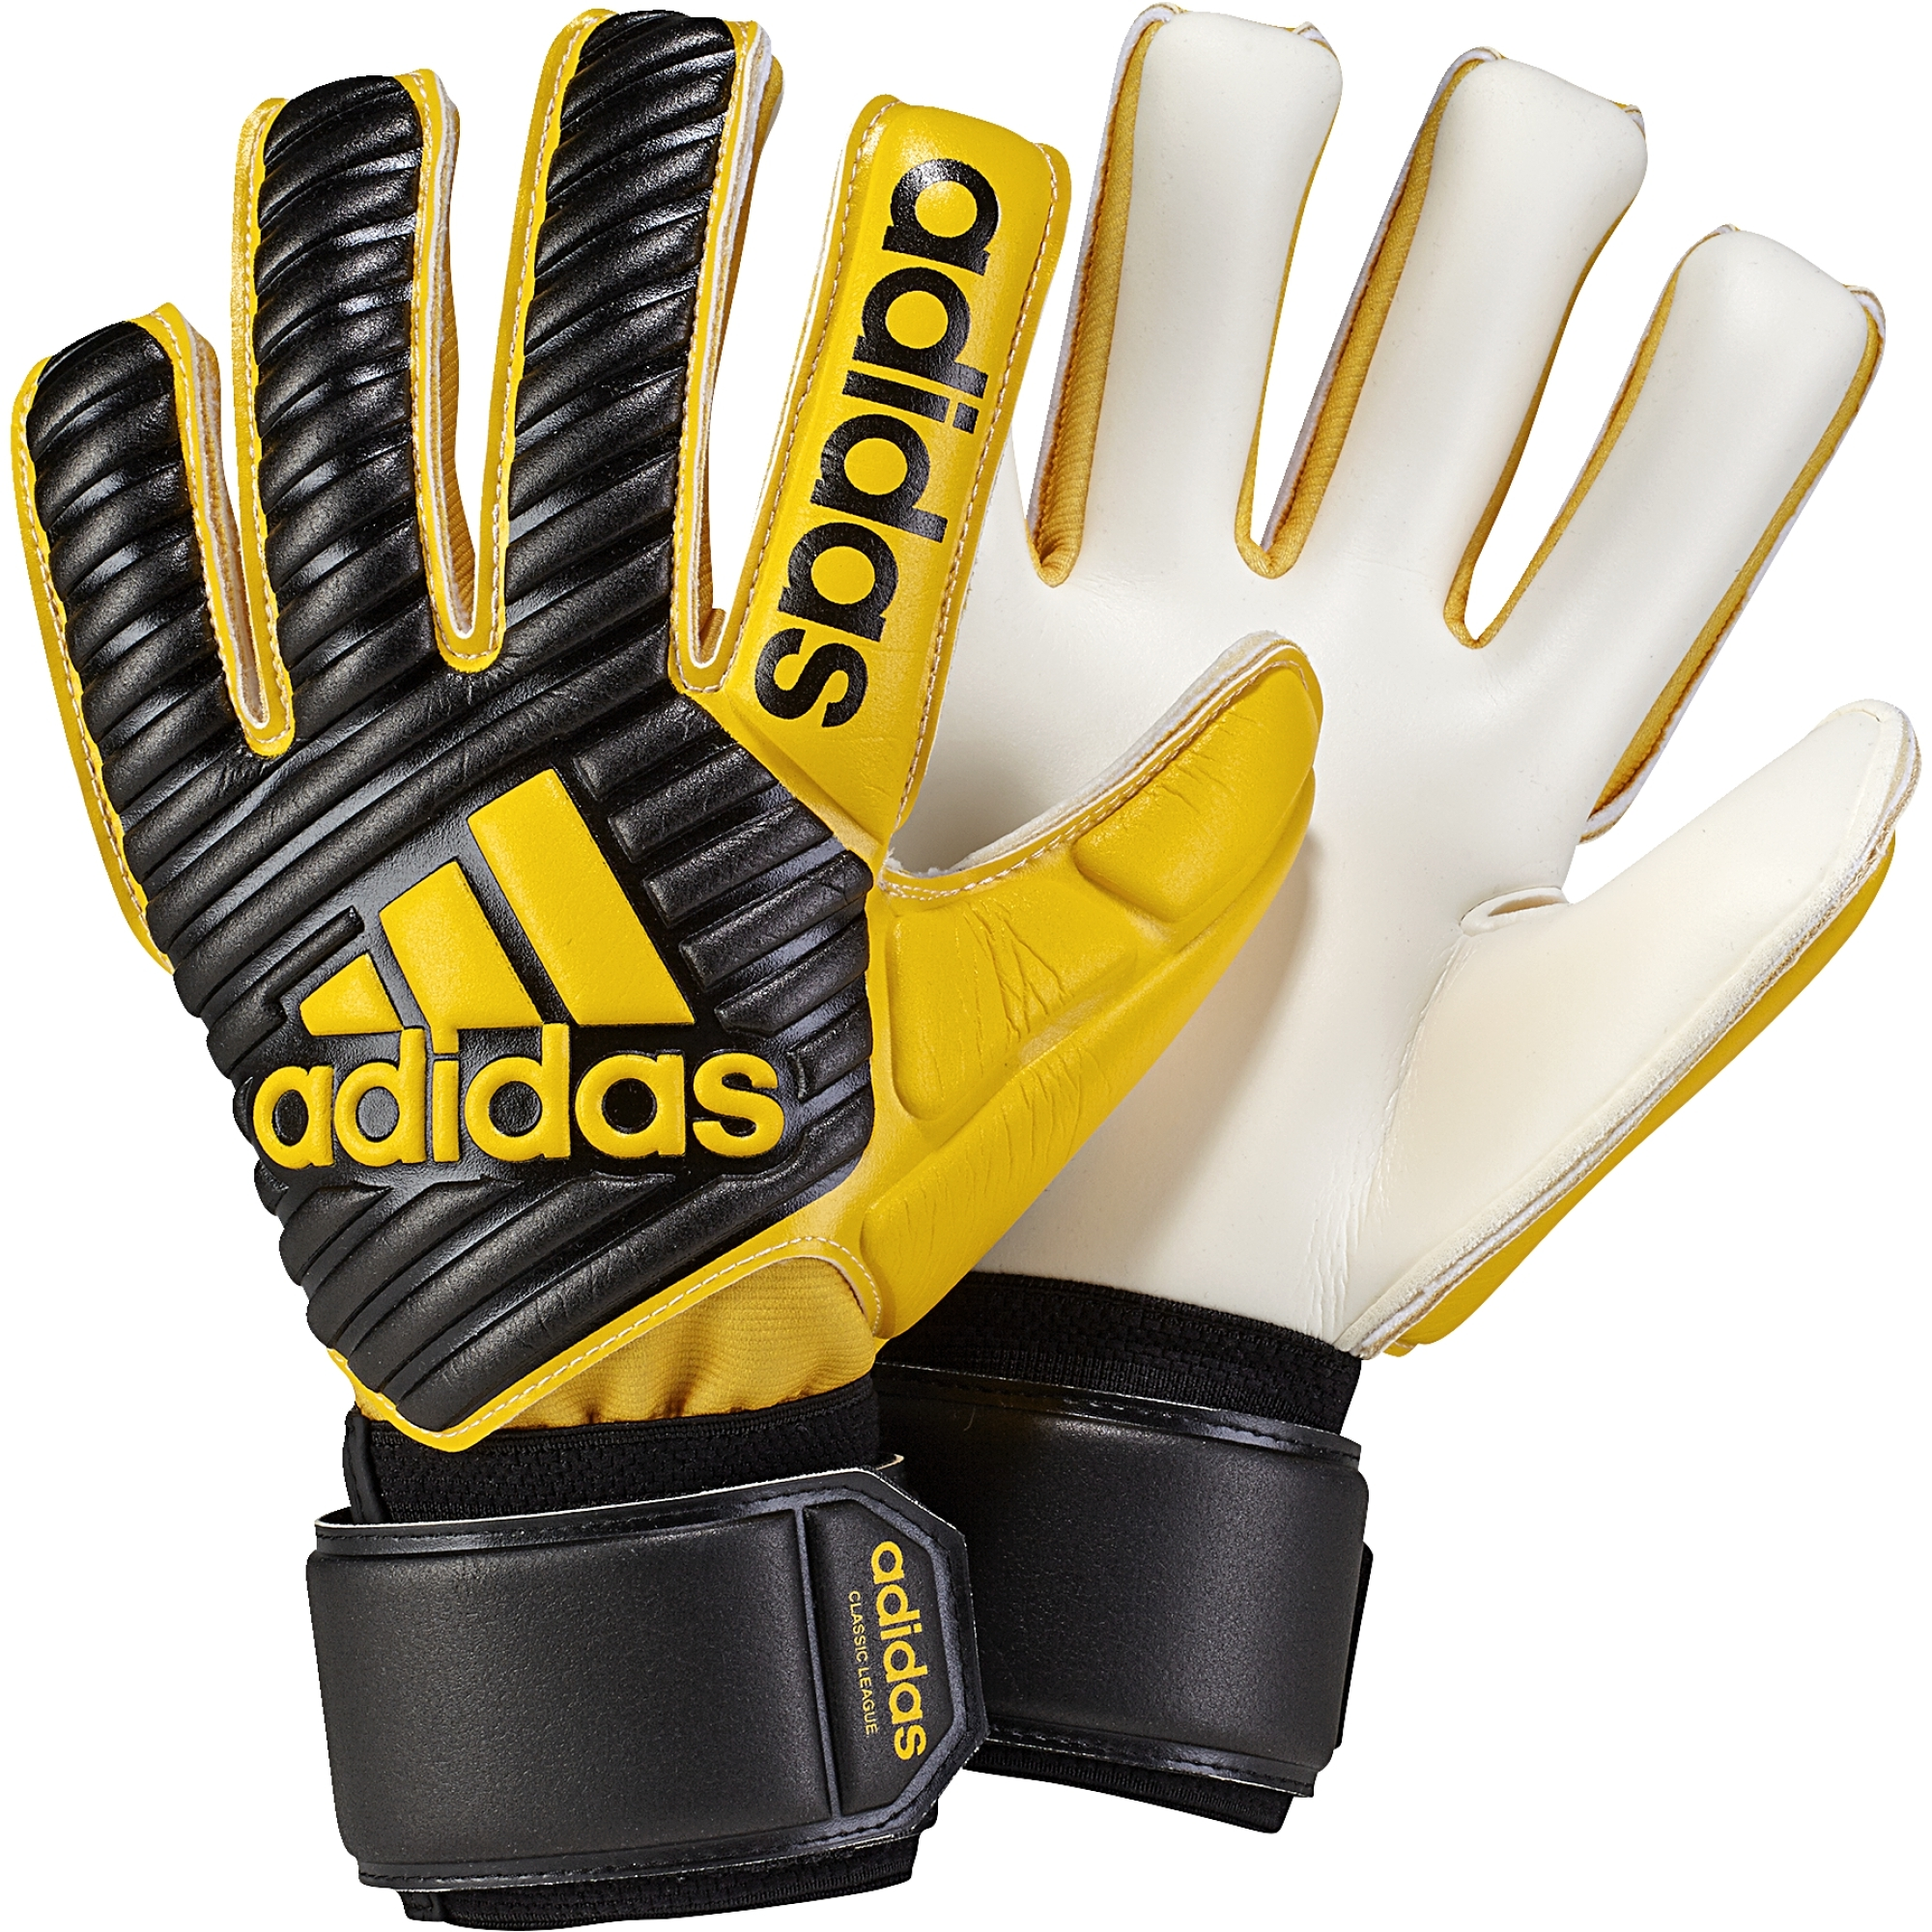 ADIDAS brankářské rukavice CLASSIC LEAGUE  9f4c13025c